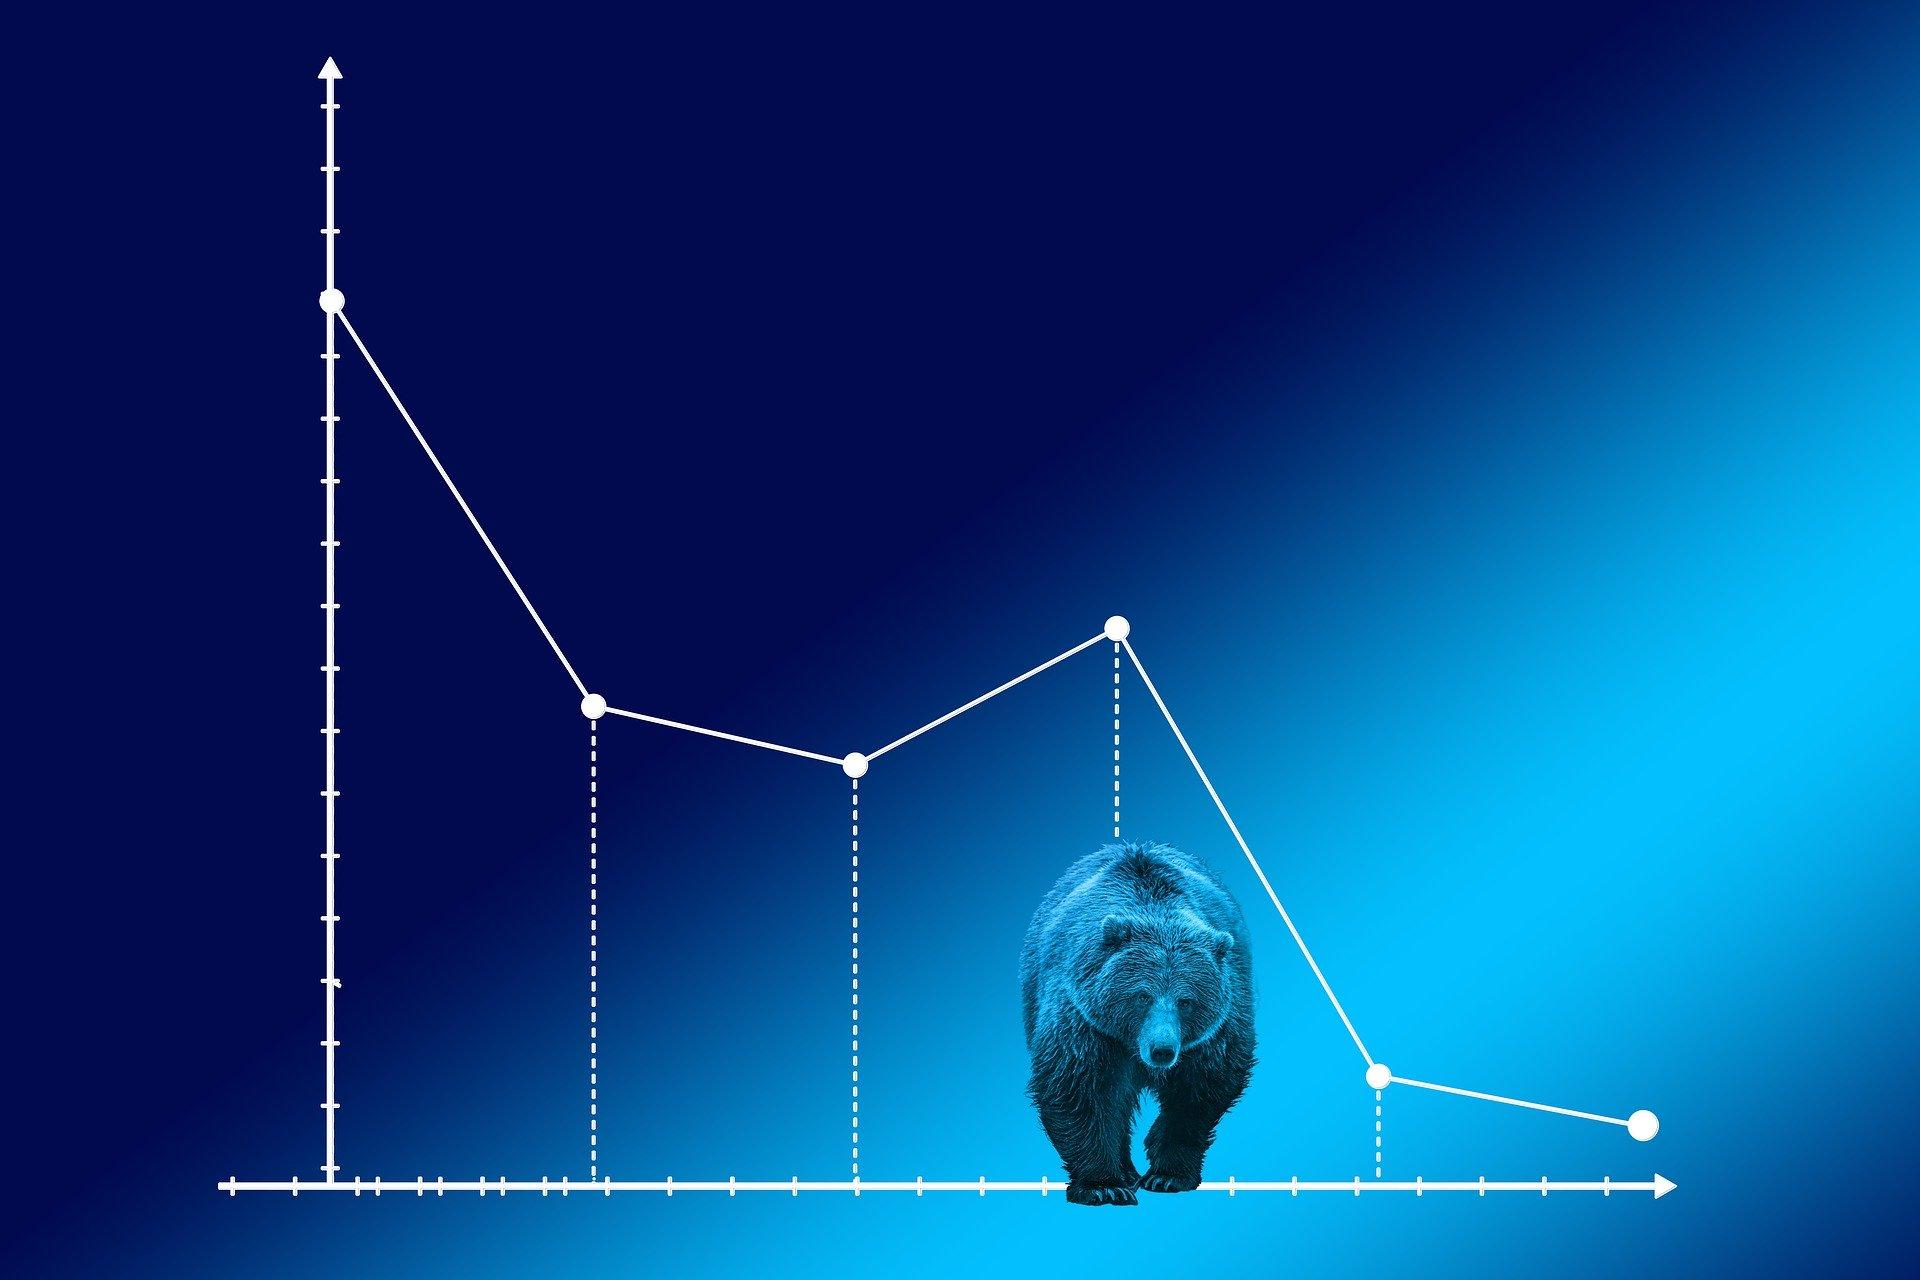 Bear stock market recession chart